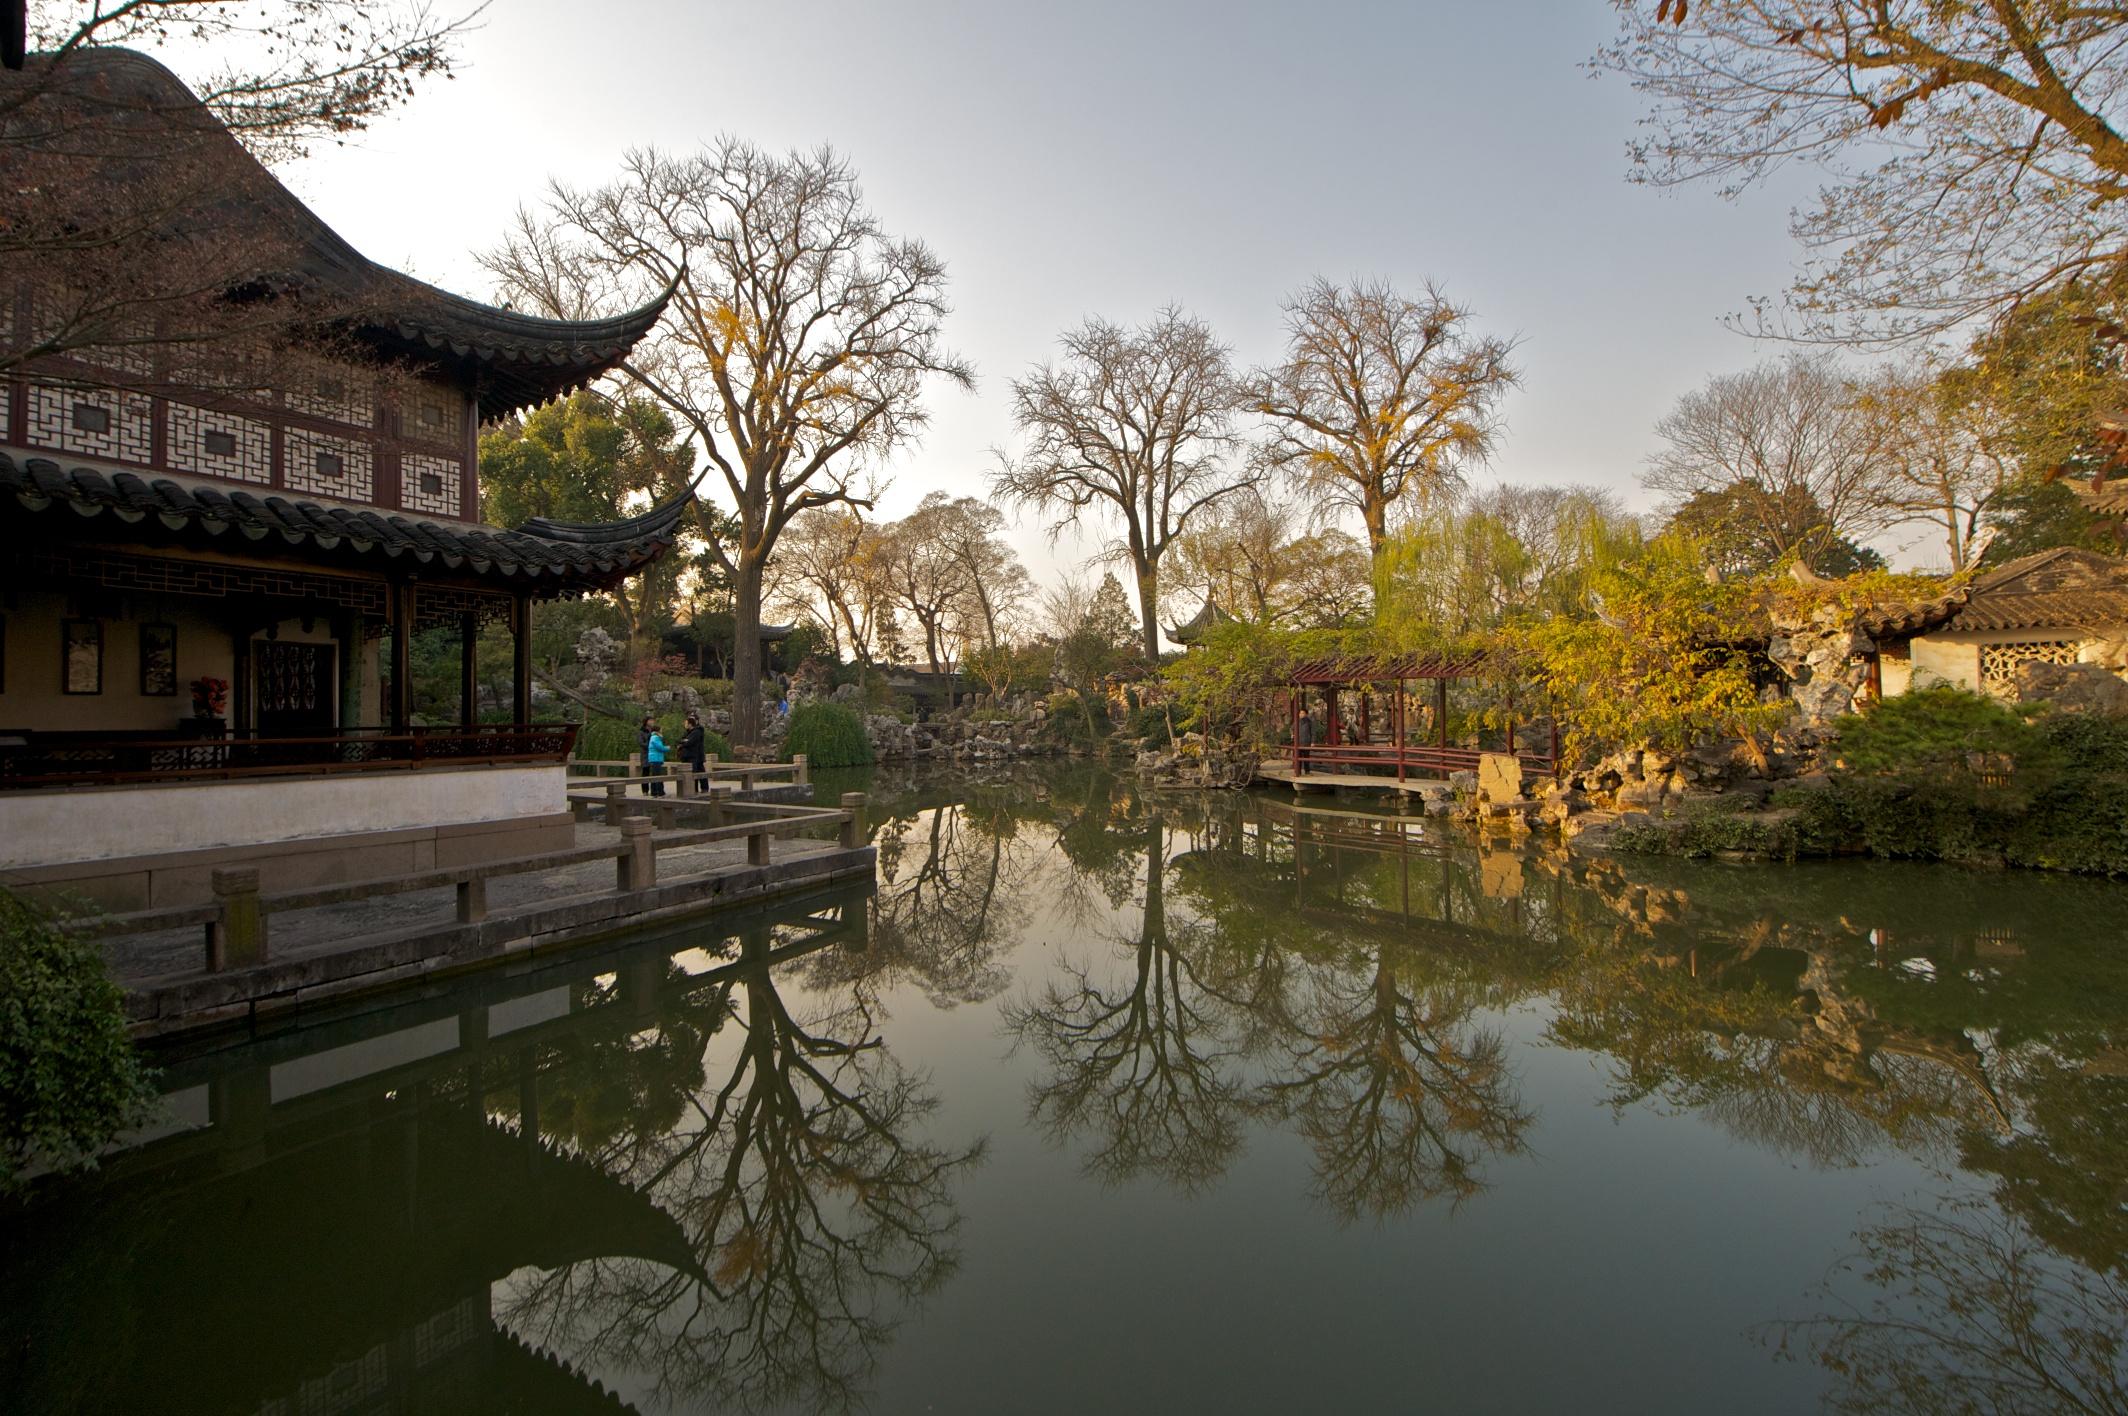 Giardino cinese wikiwand for Giardino cinese